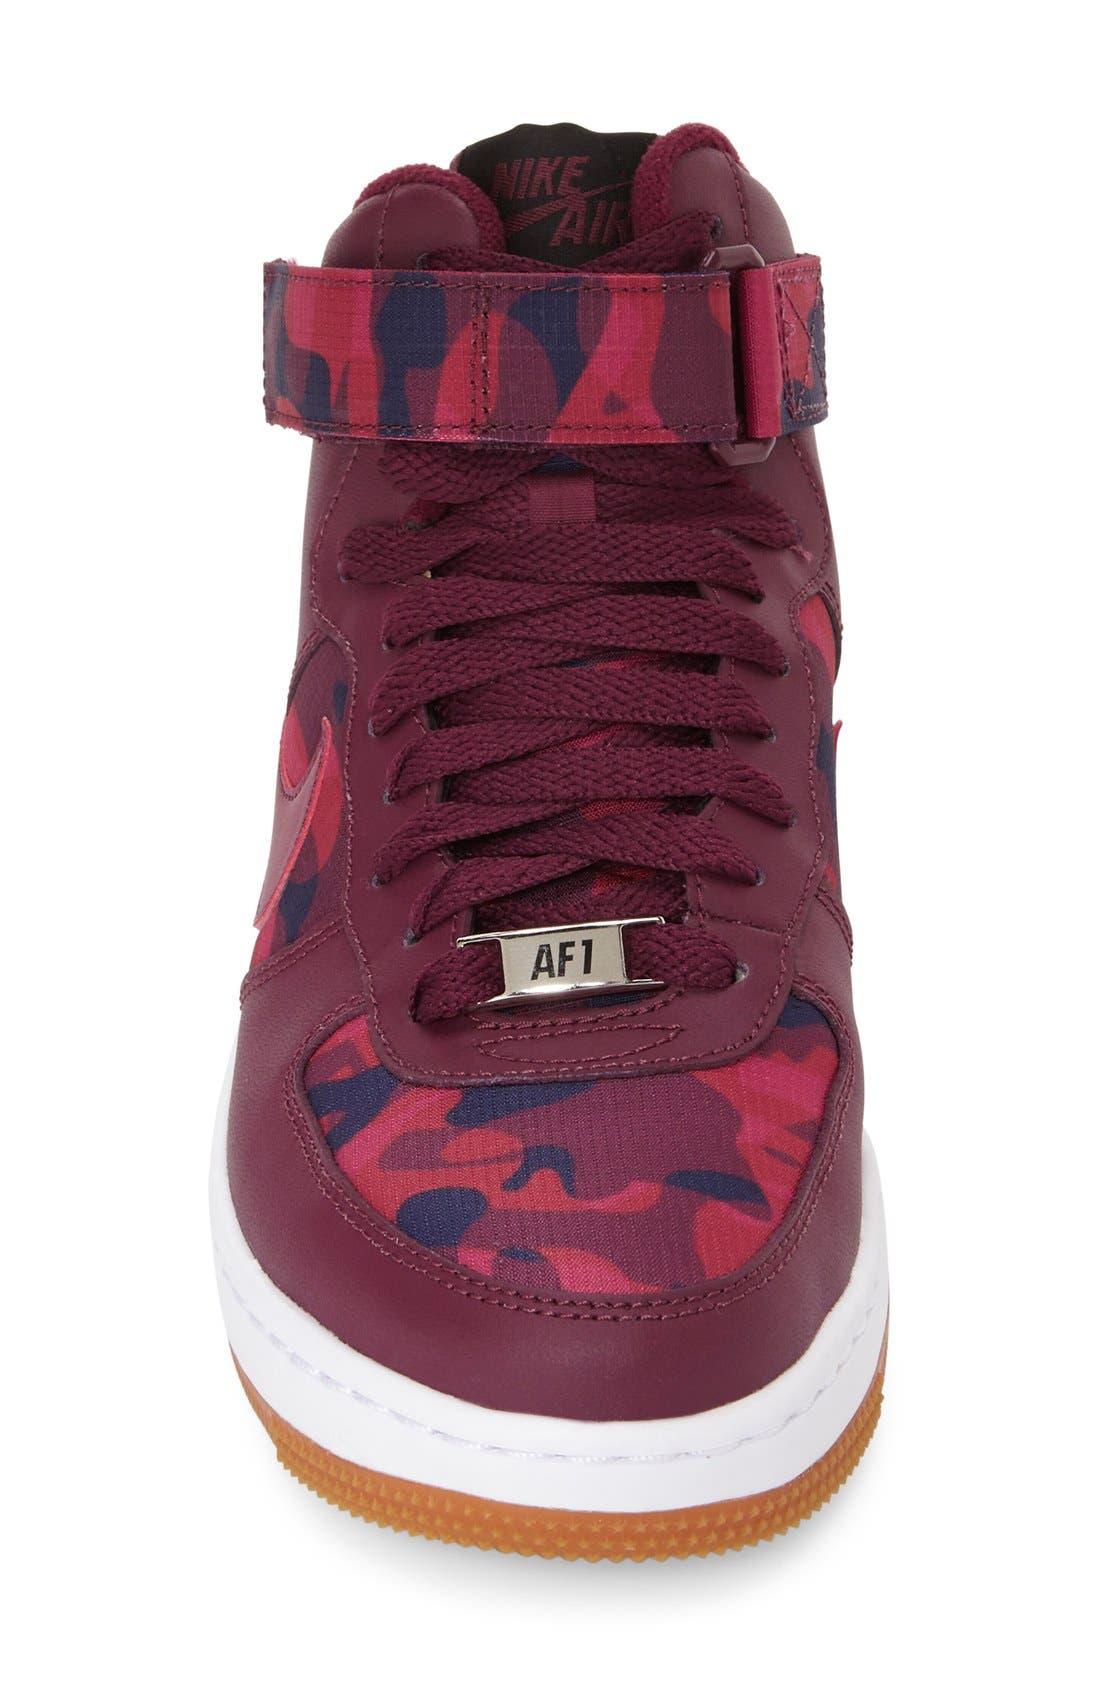 Alternate Image 3  - Nike 'AF-1 Ultra Force' Sneaker (Women)